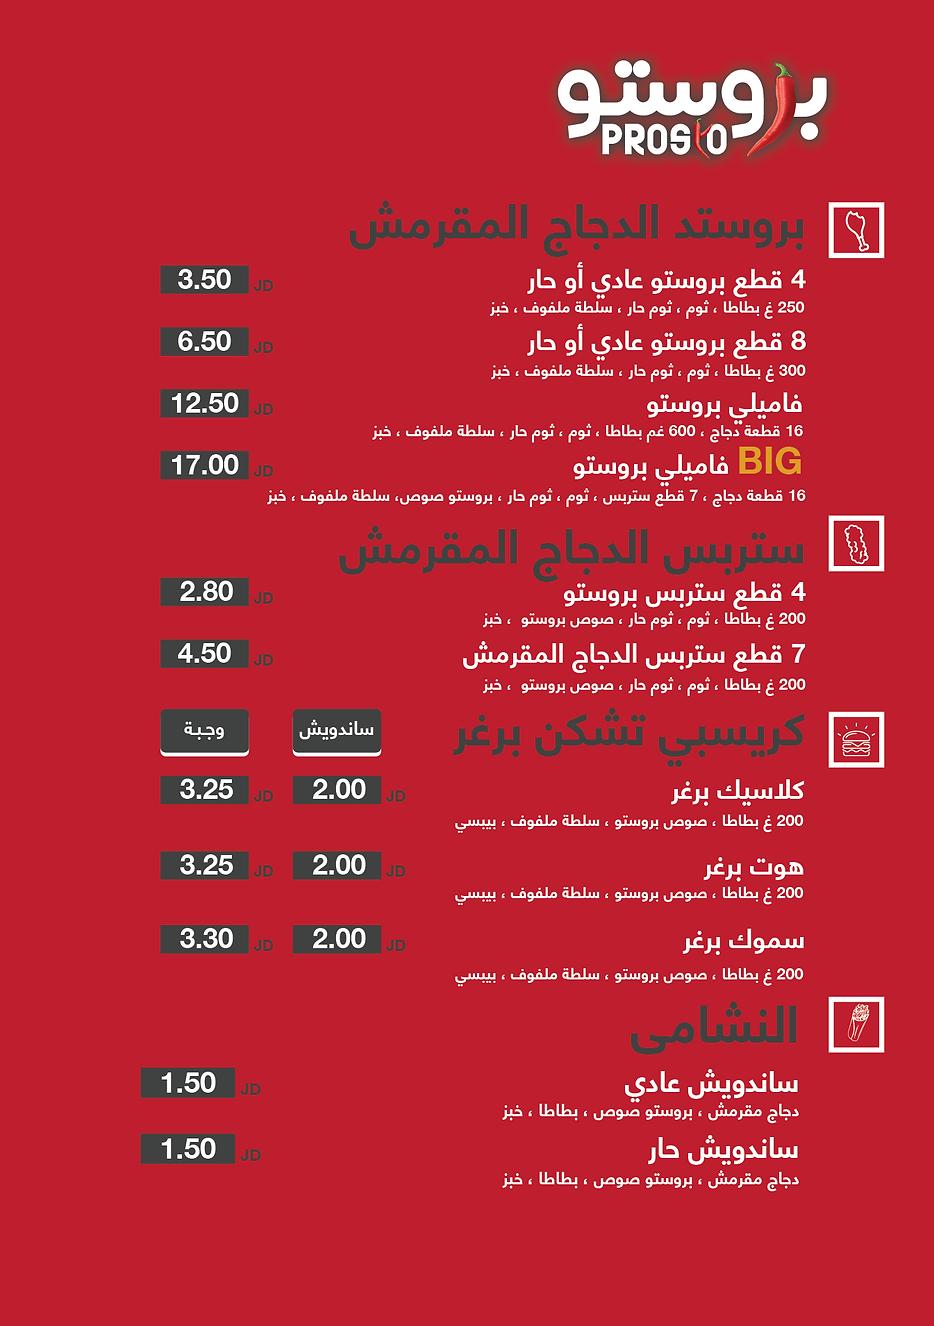 brosto menu - Copy-01.png